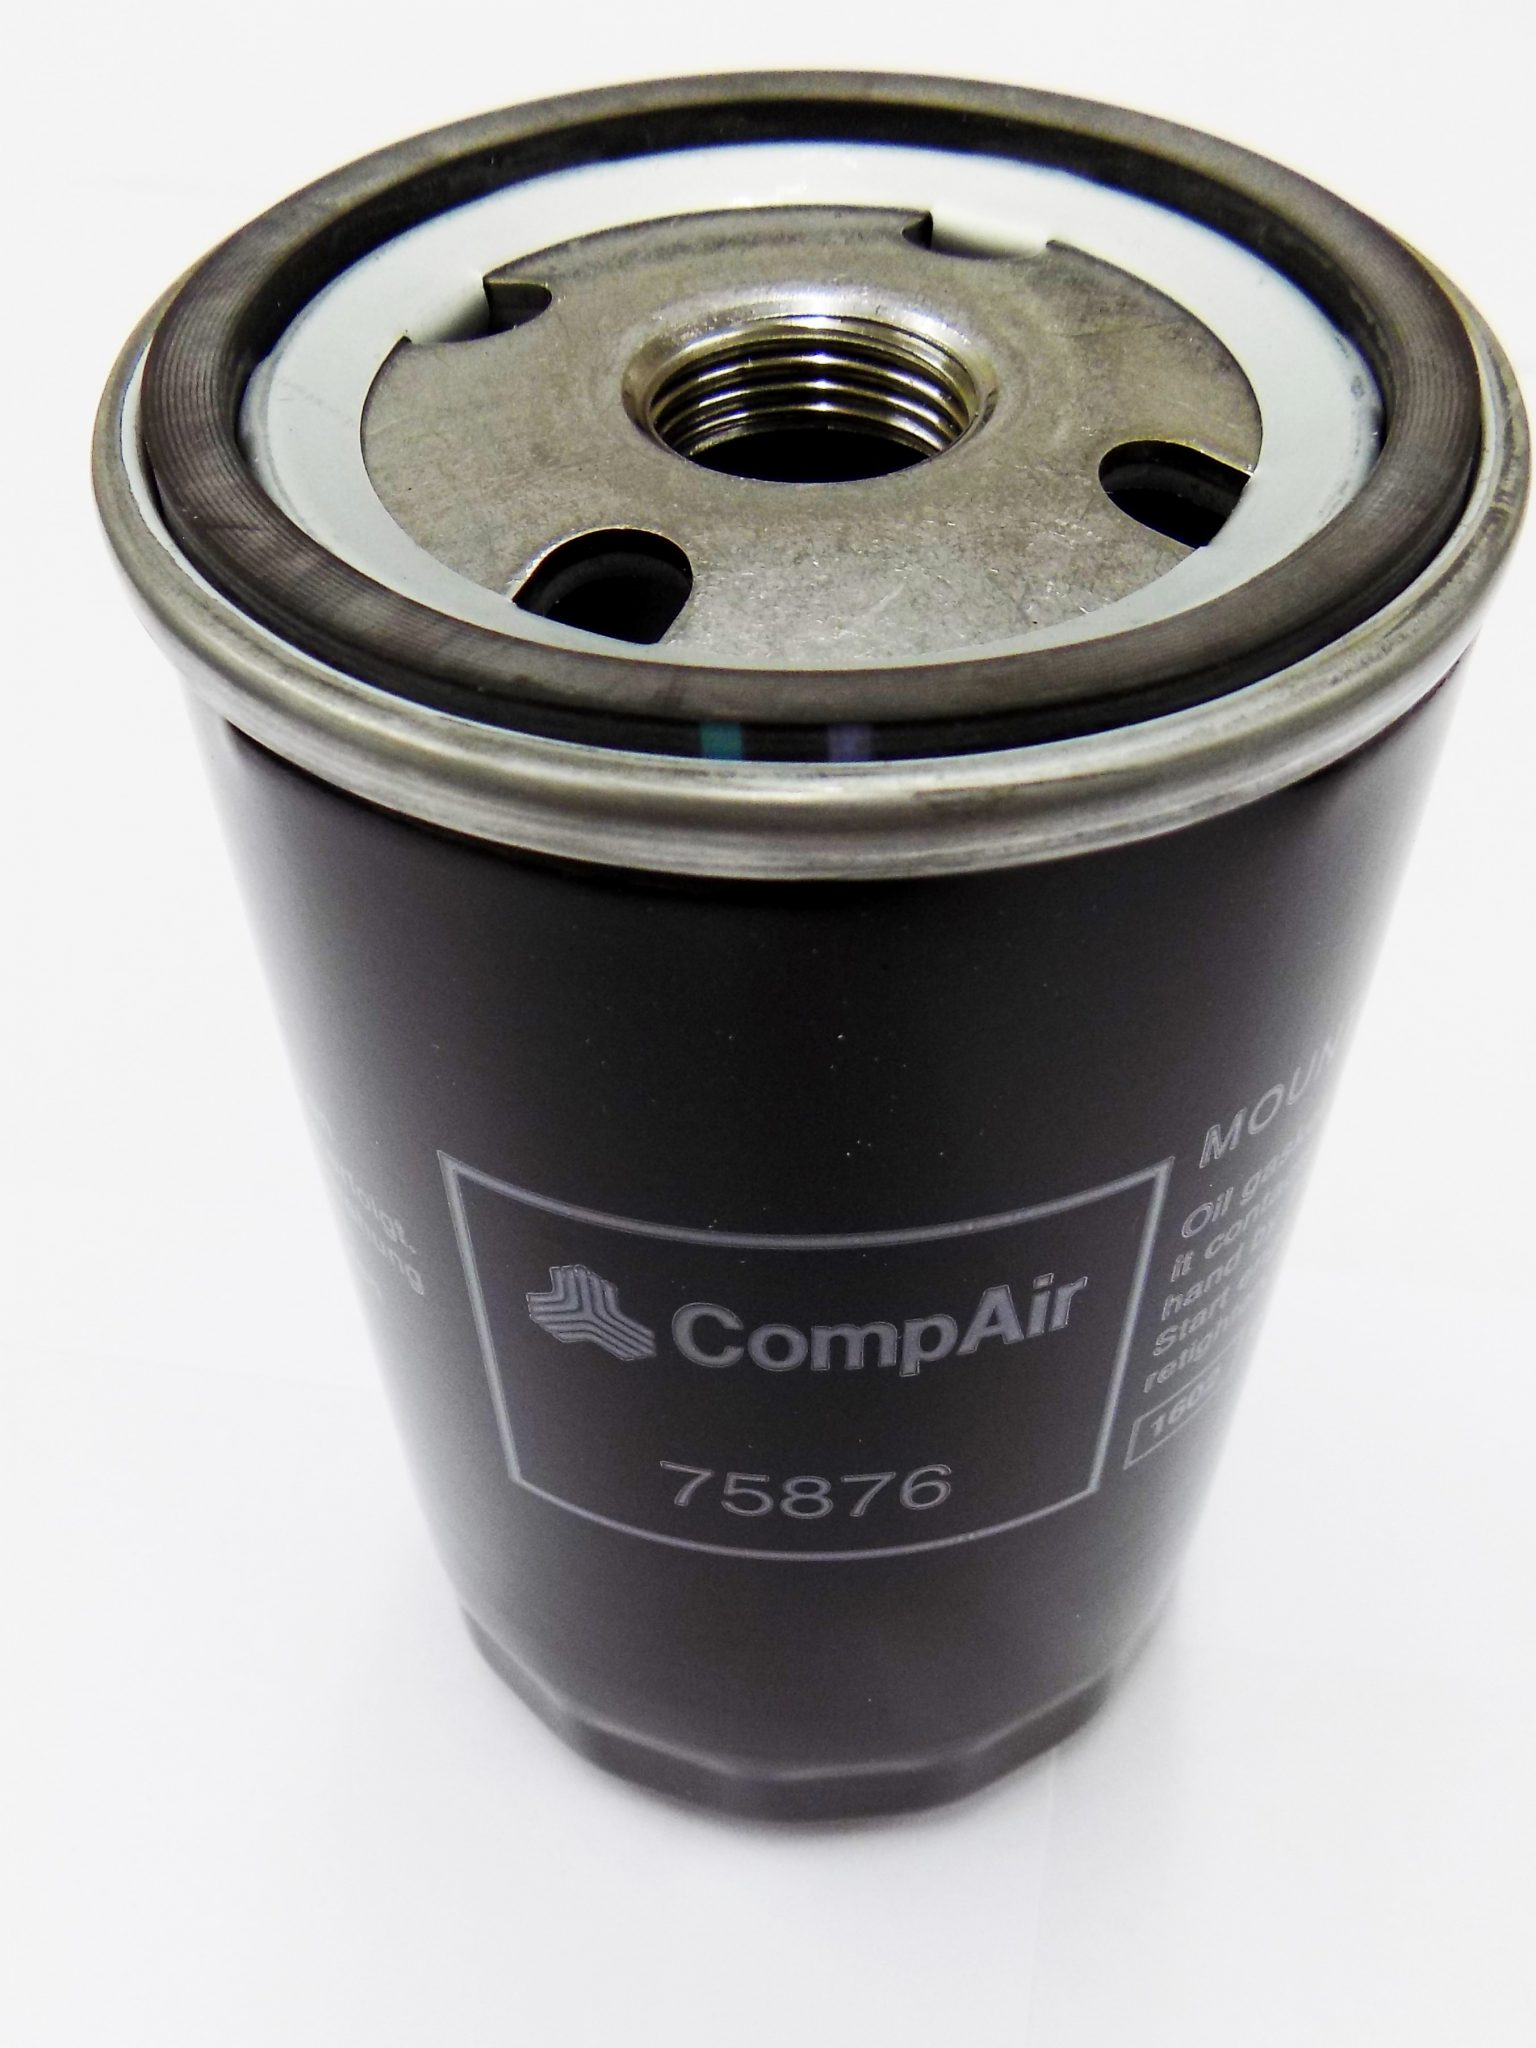 CompAir Spare Air Compressor Parts